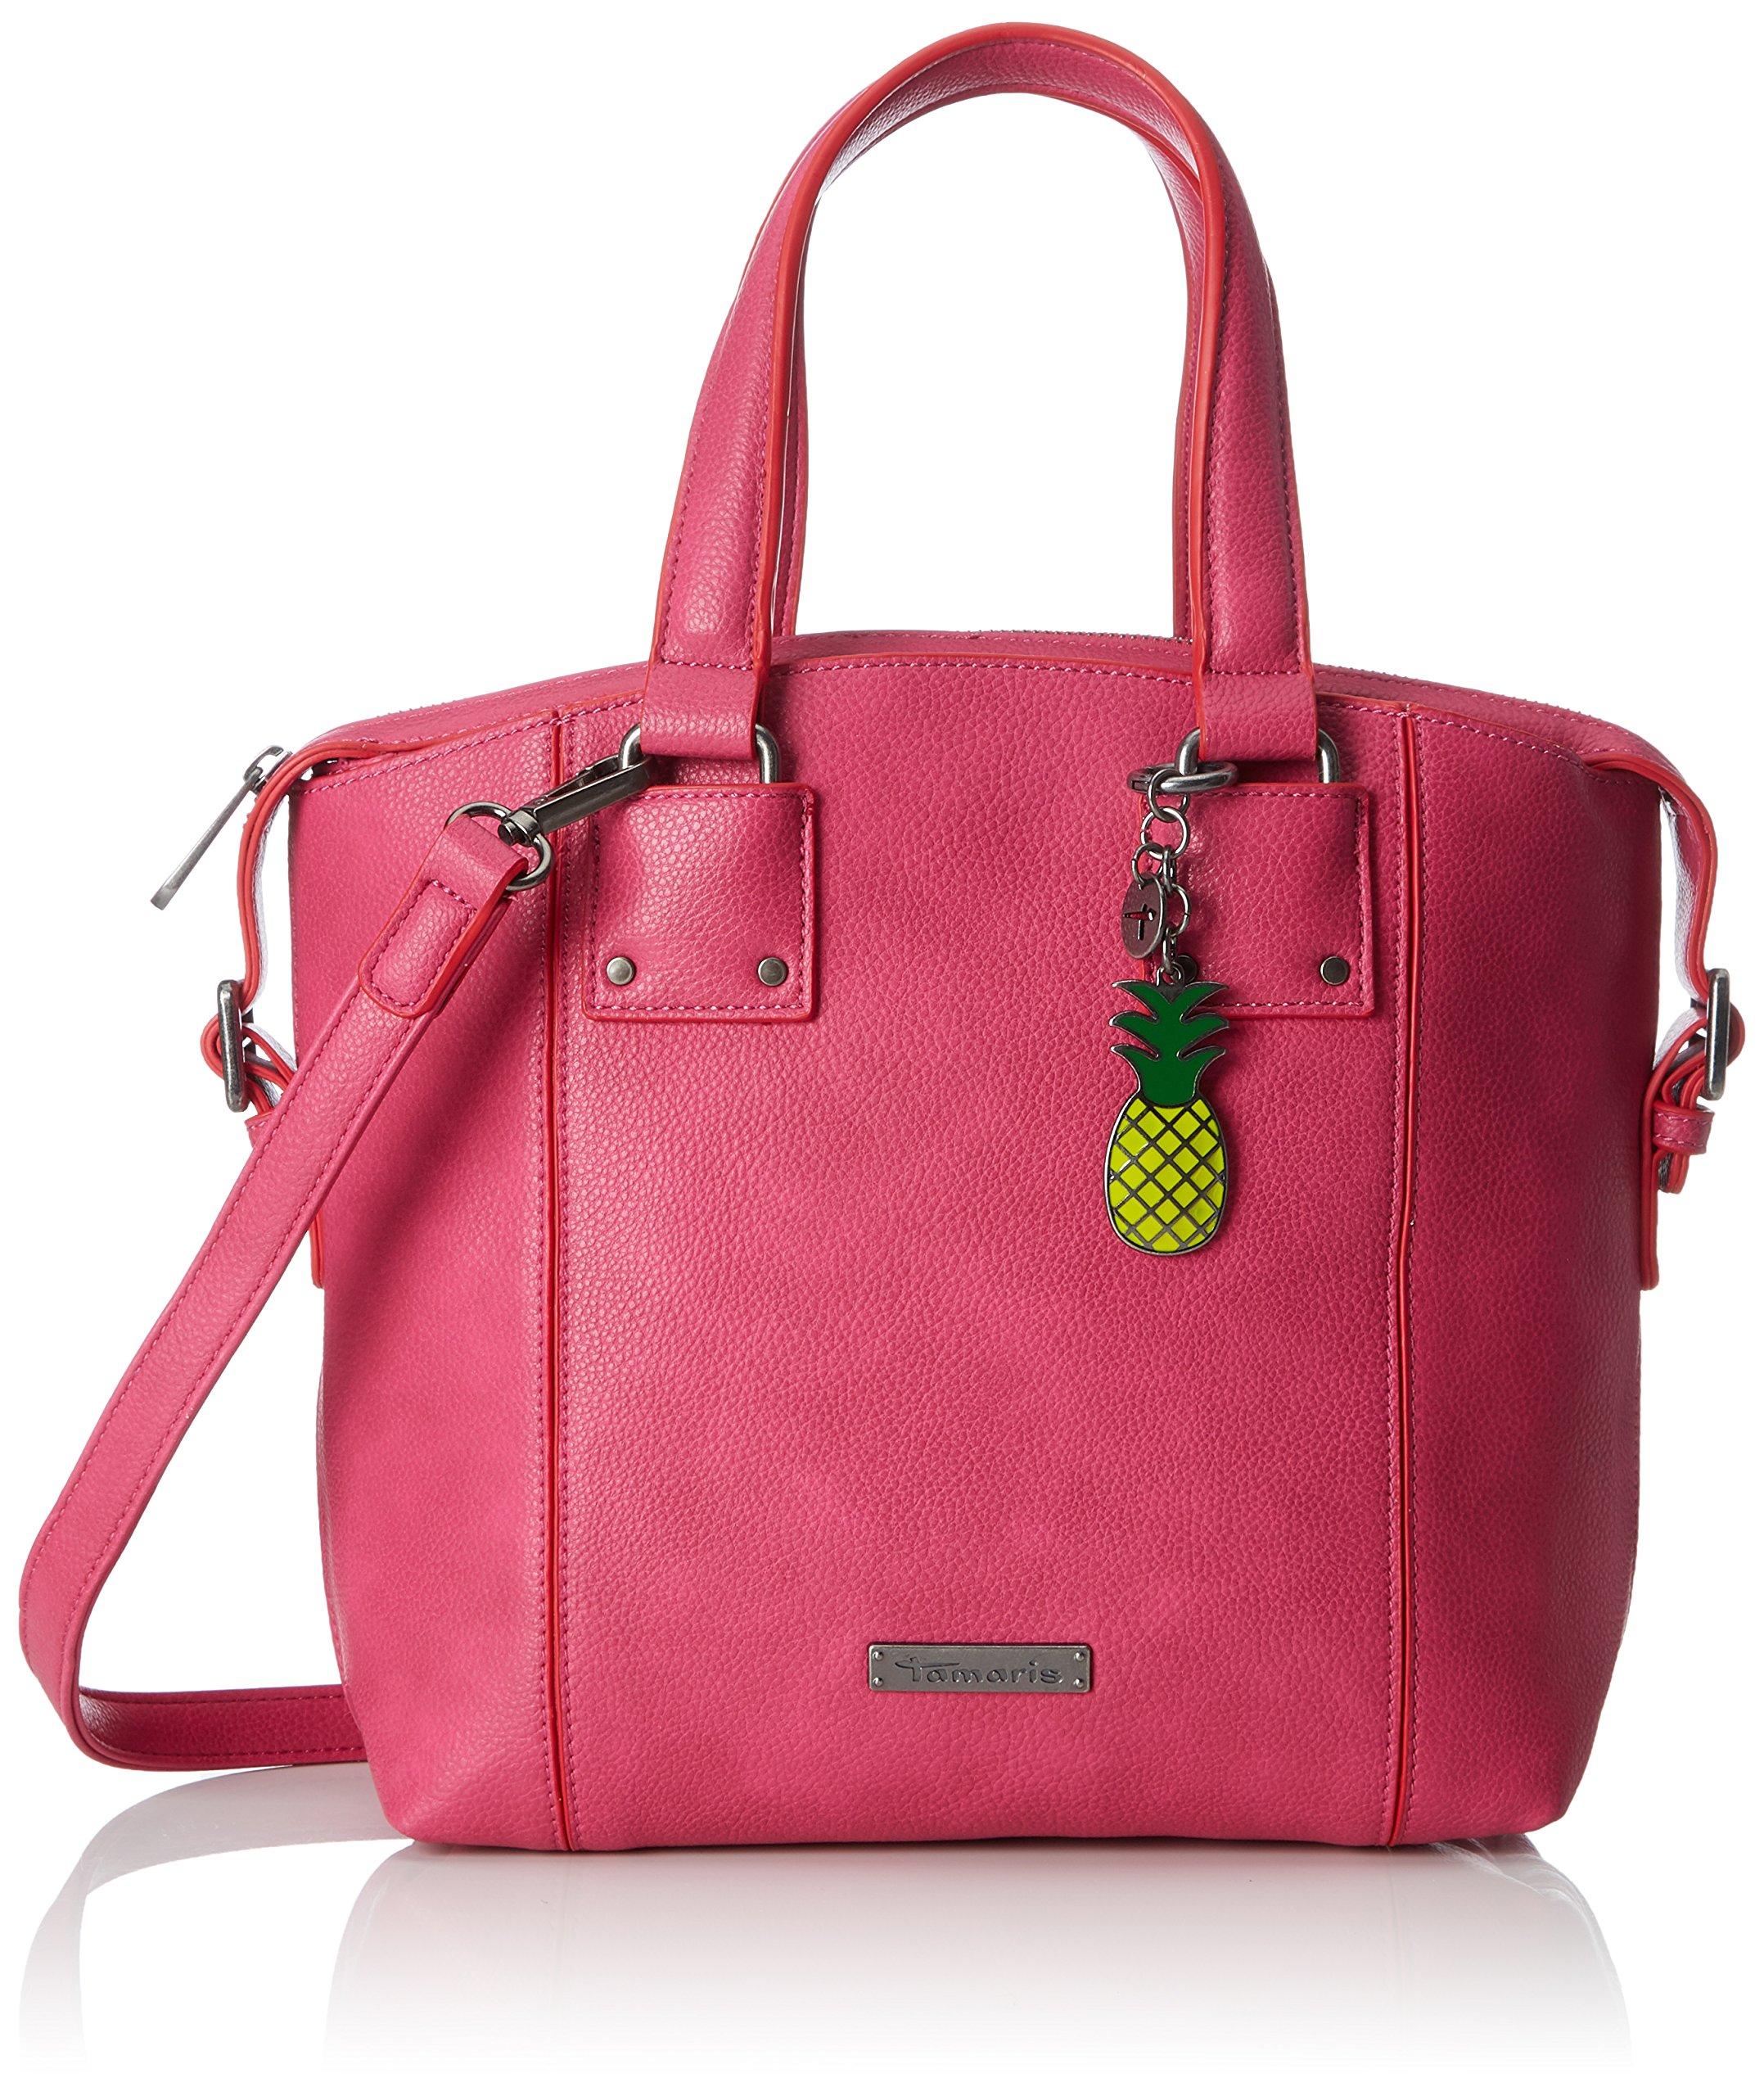 X H Tamaris HandbagCartables T FemmePink12x27x25 Cmb Lorella TPukXZiO